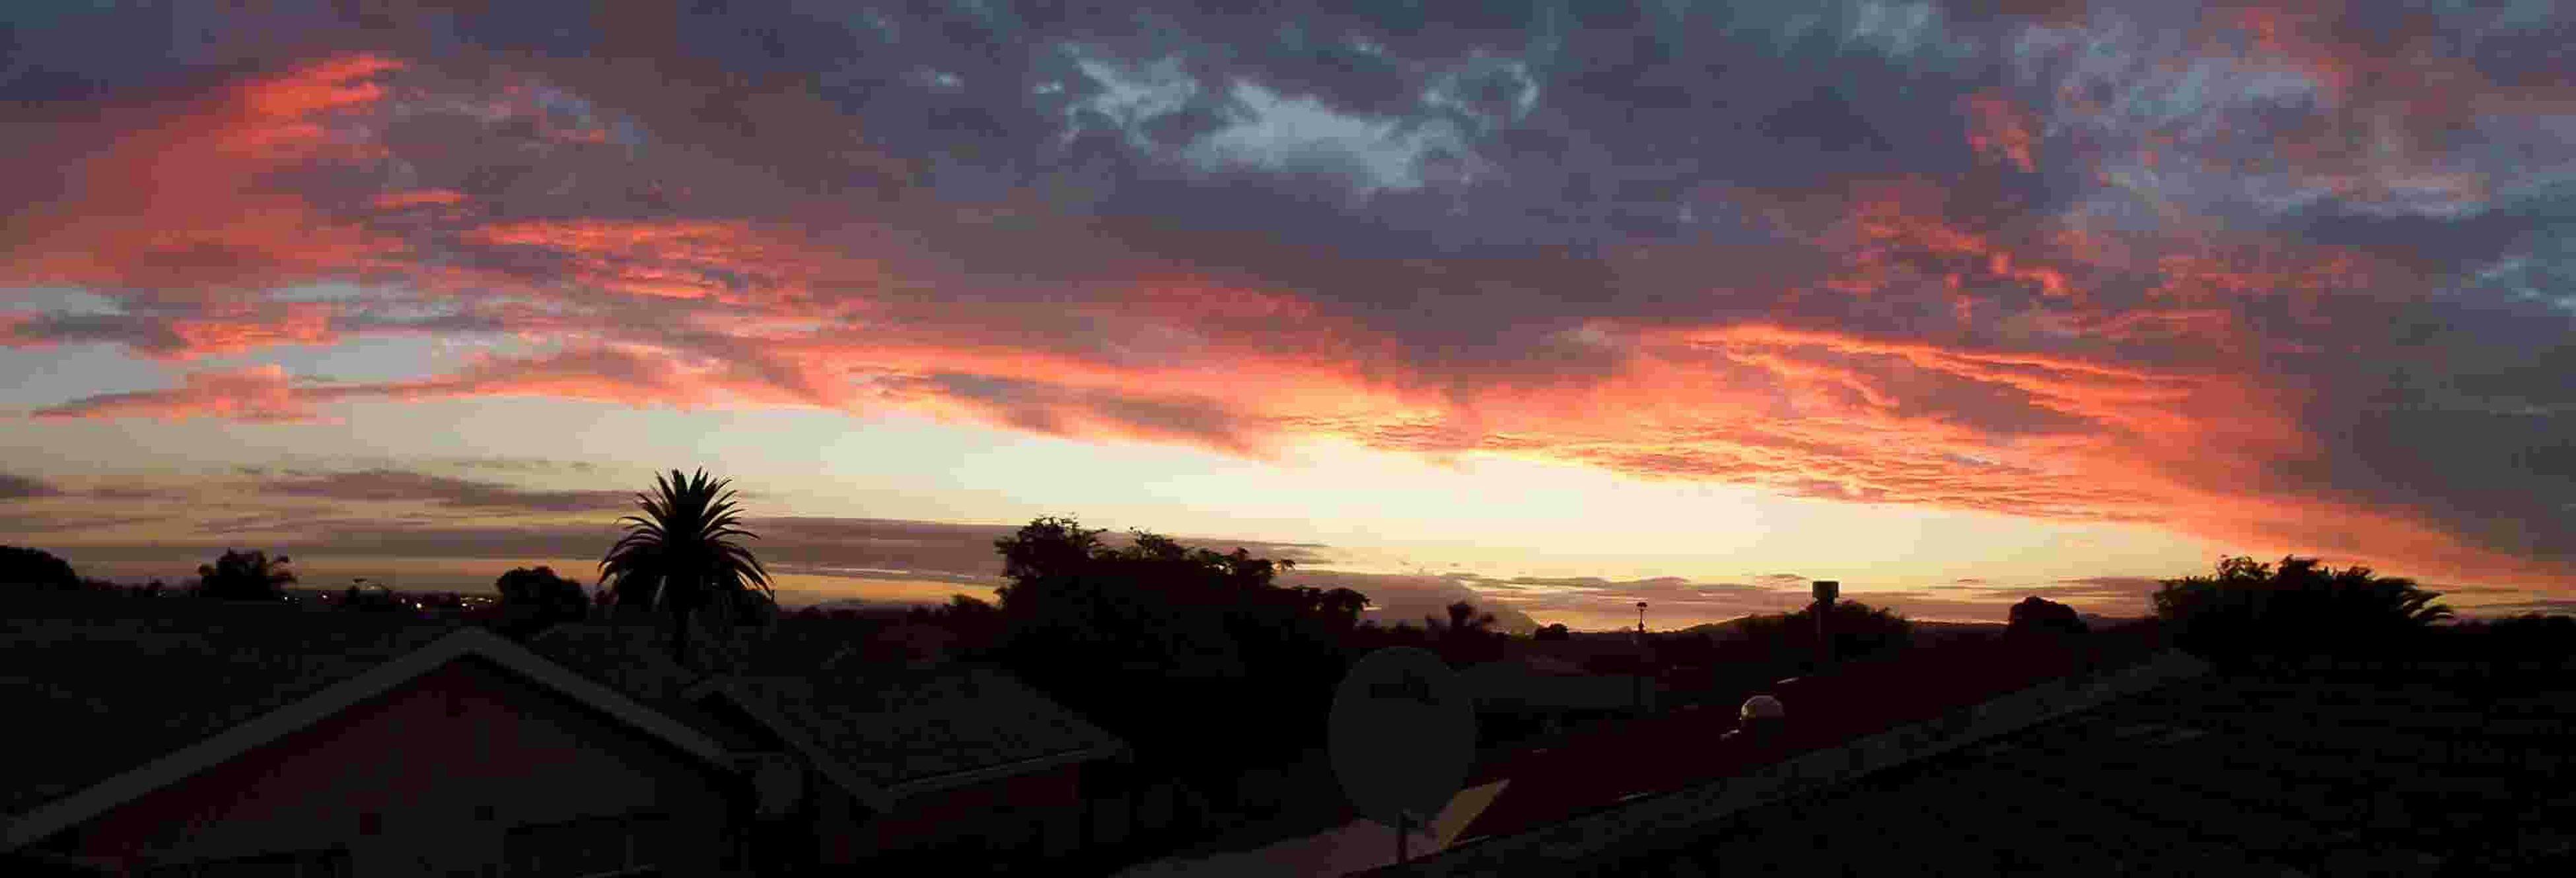 sunset, building exterior, architecture, built structure, sky, orange color, house, cloud - sky, residential structure, town, residential building, city, silhouette, outdoors, dusk, high angle view, scenics, nature, sun, sunlight